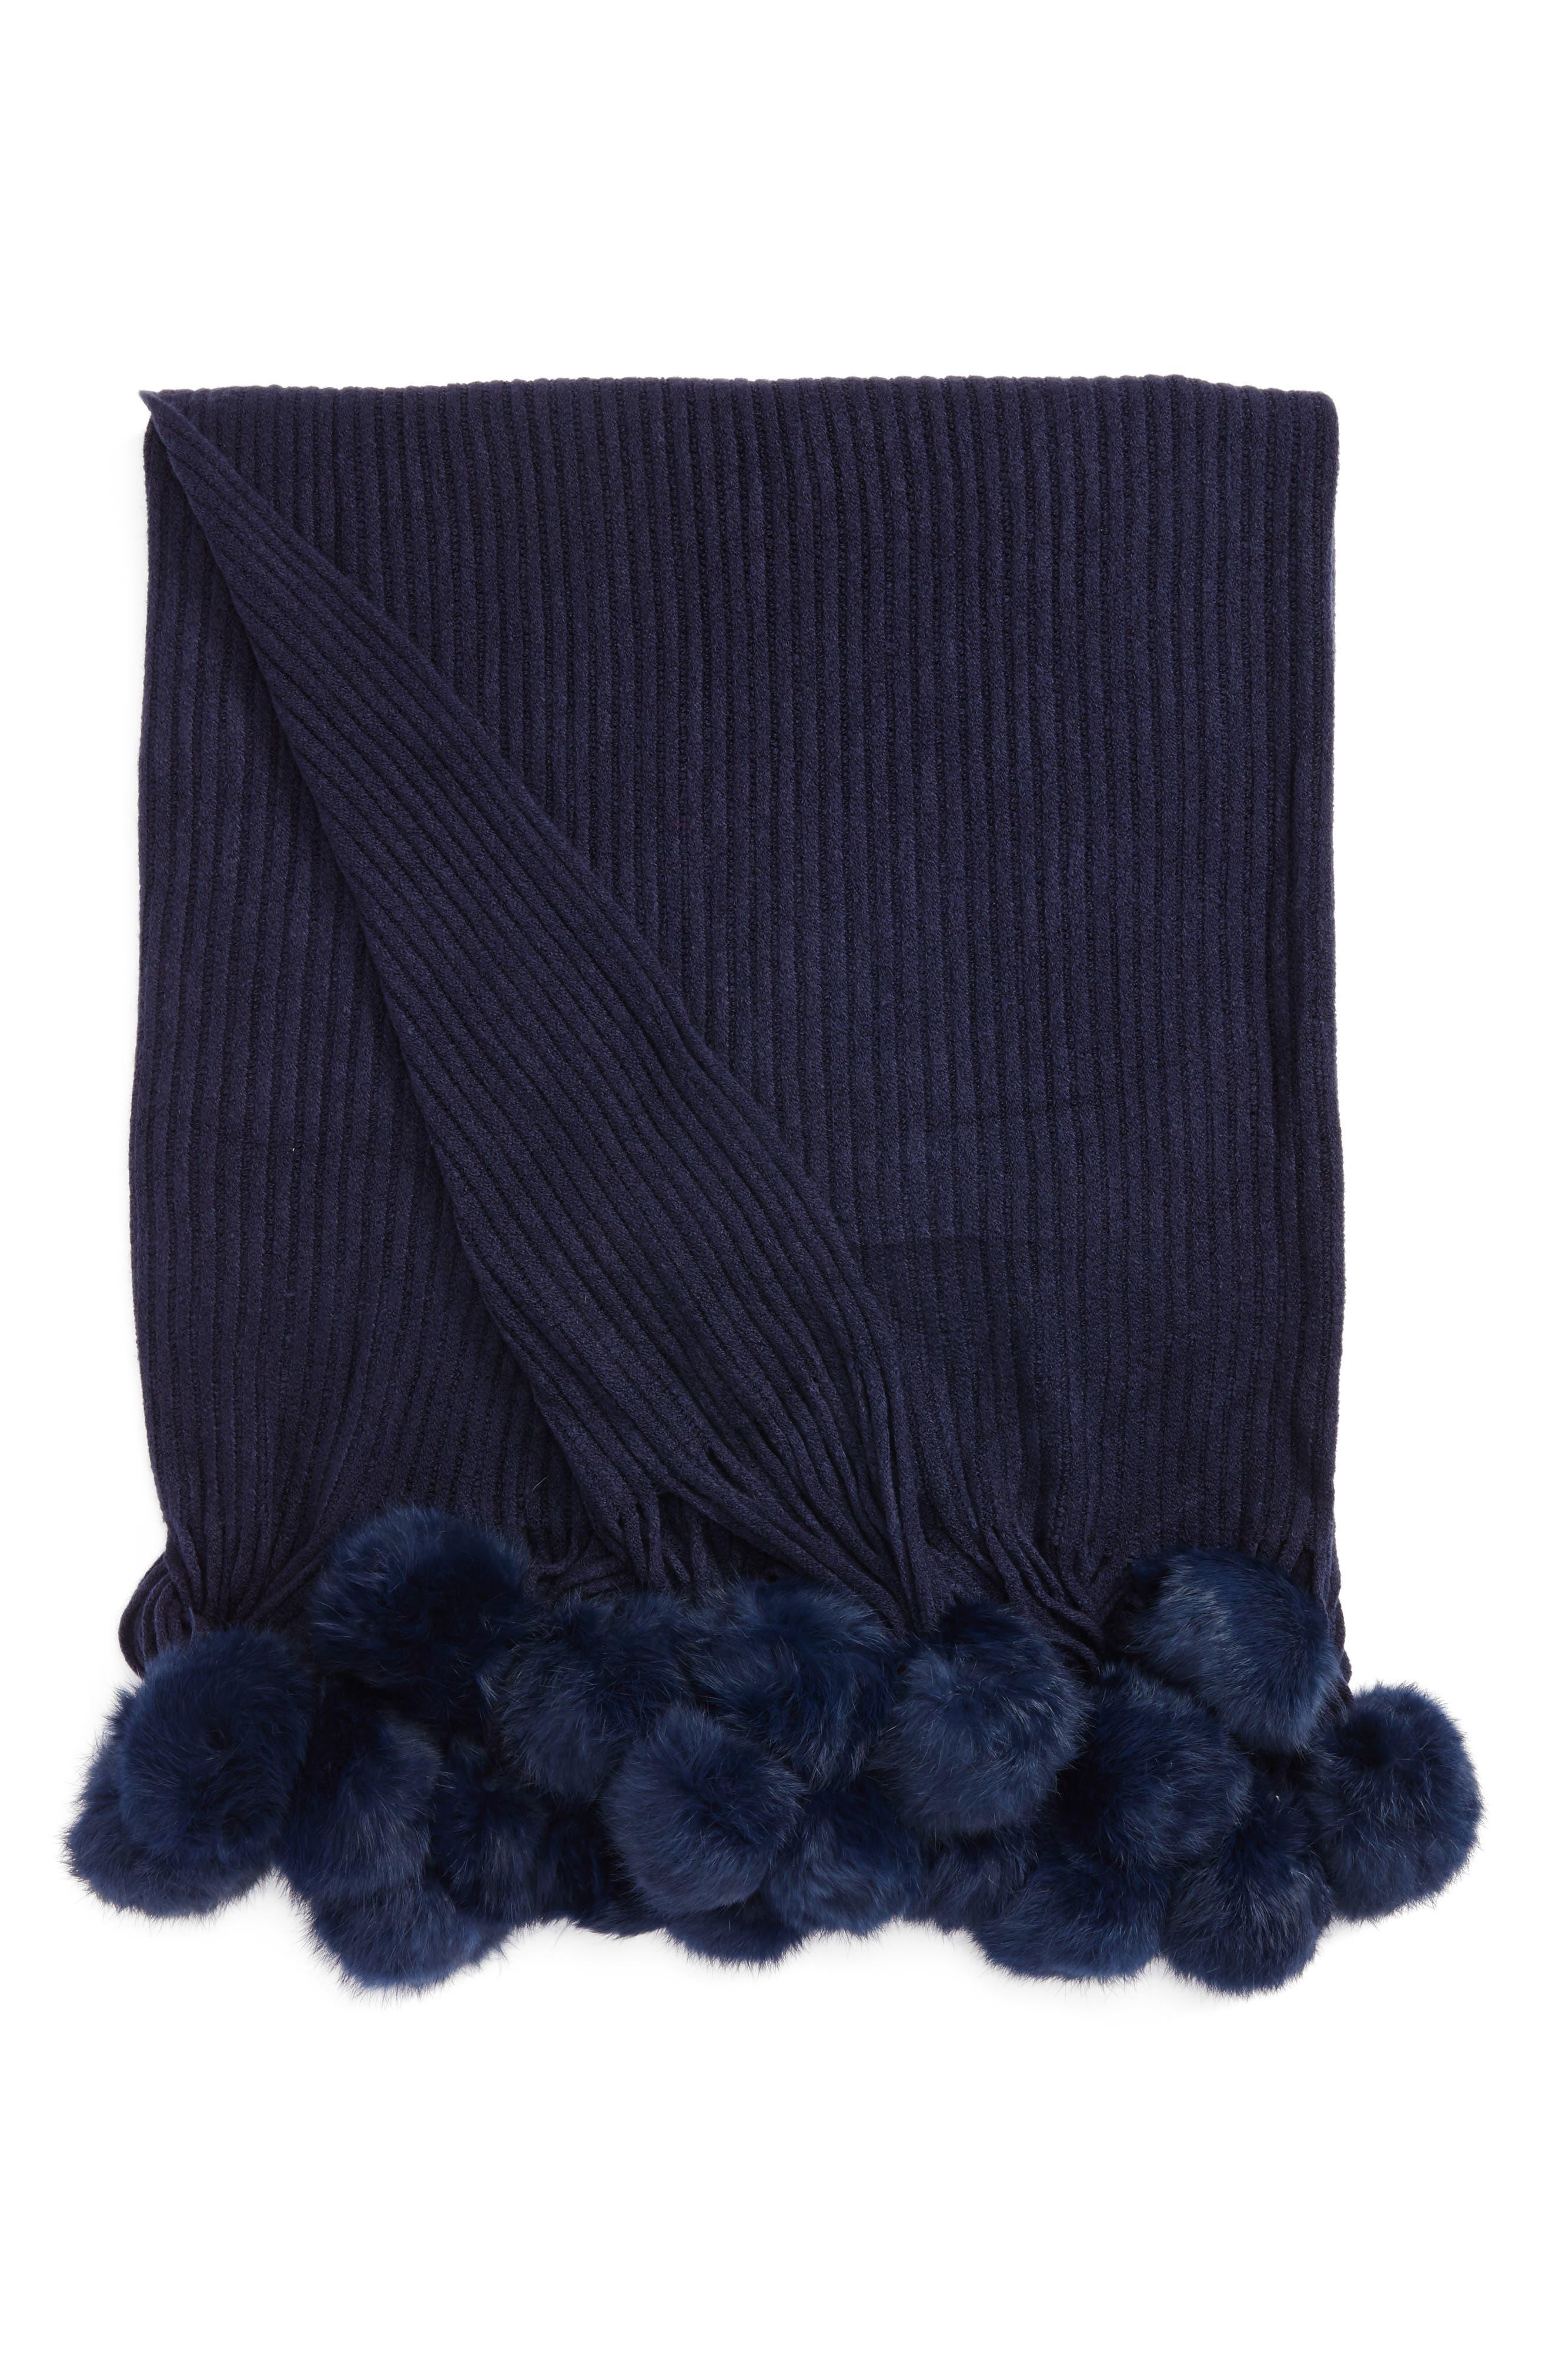 Main Image - Echo Genuine Rabbit Fur Pompom Rib Knit Throw